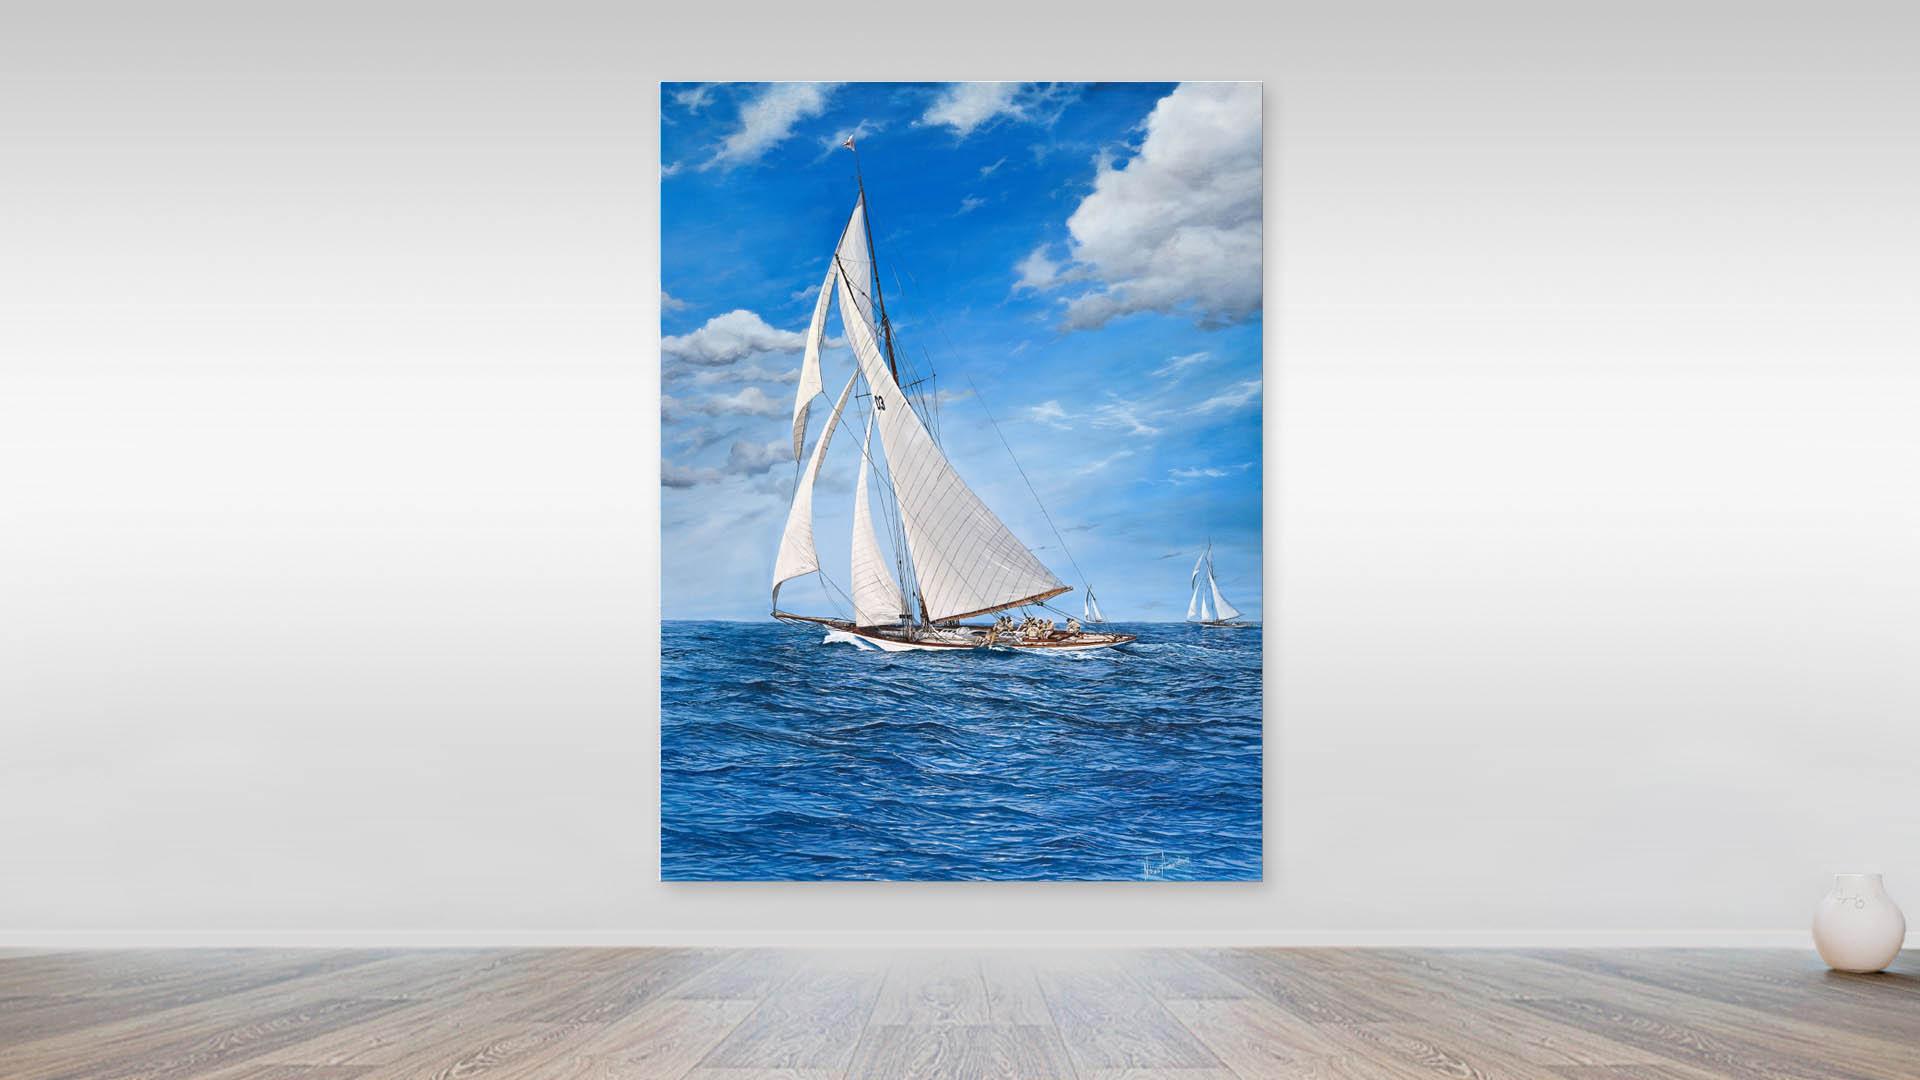 Tuiga, Monaco Yacht Club